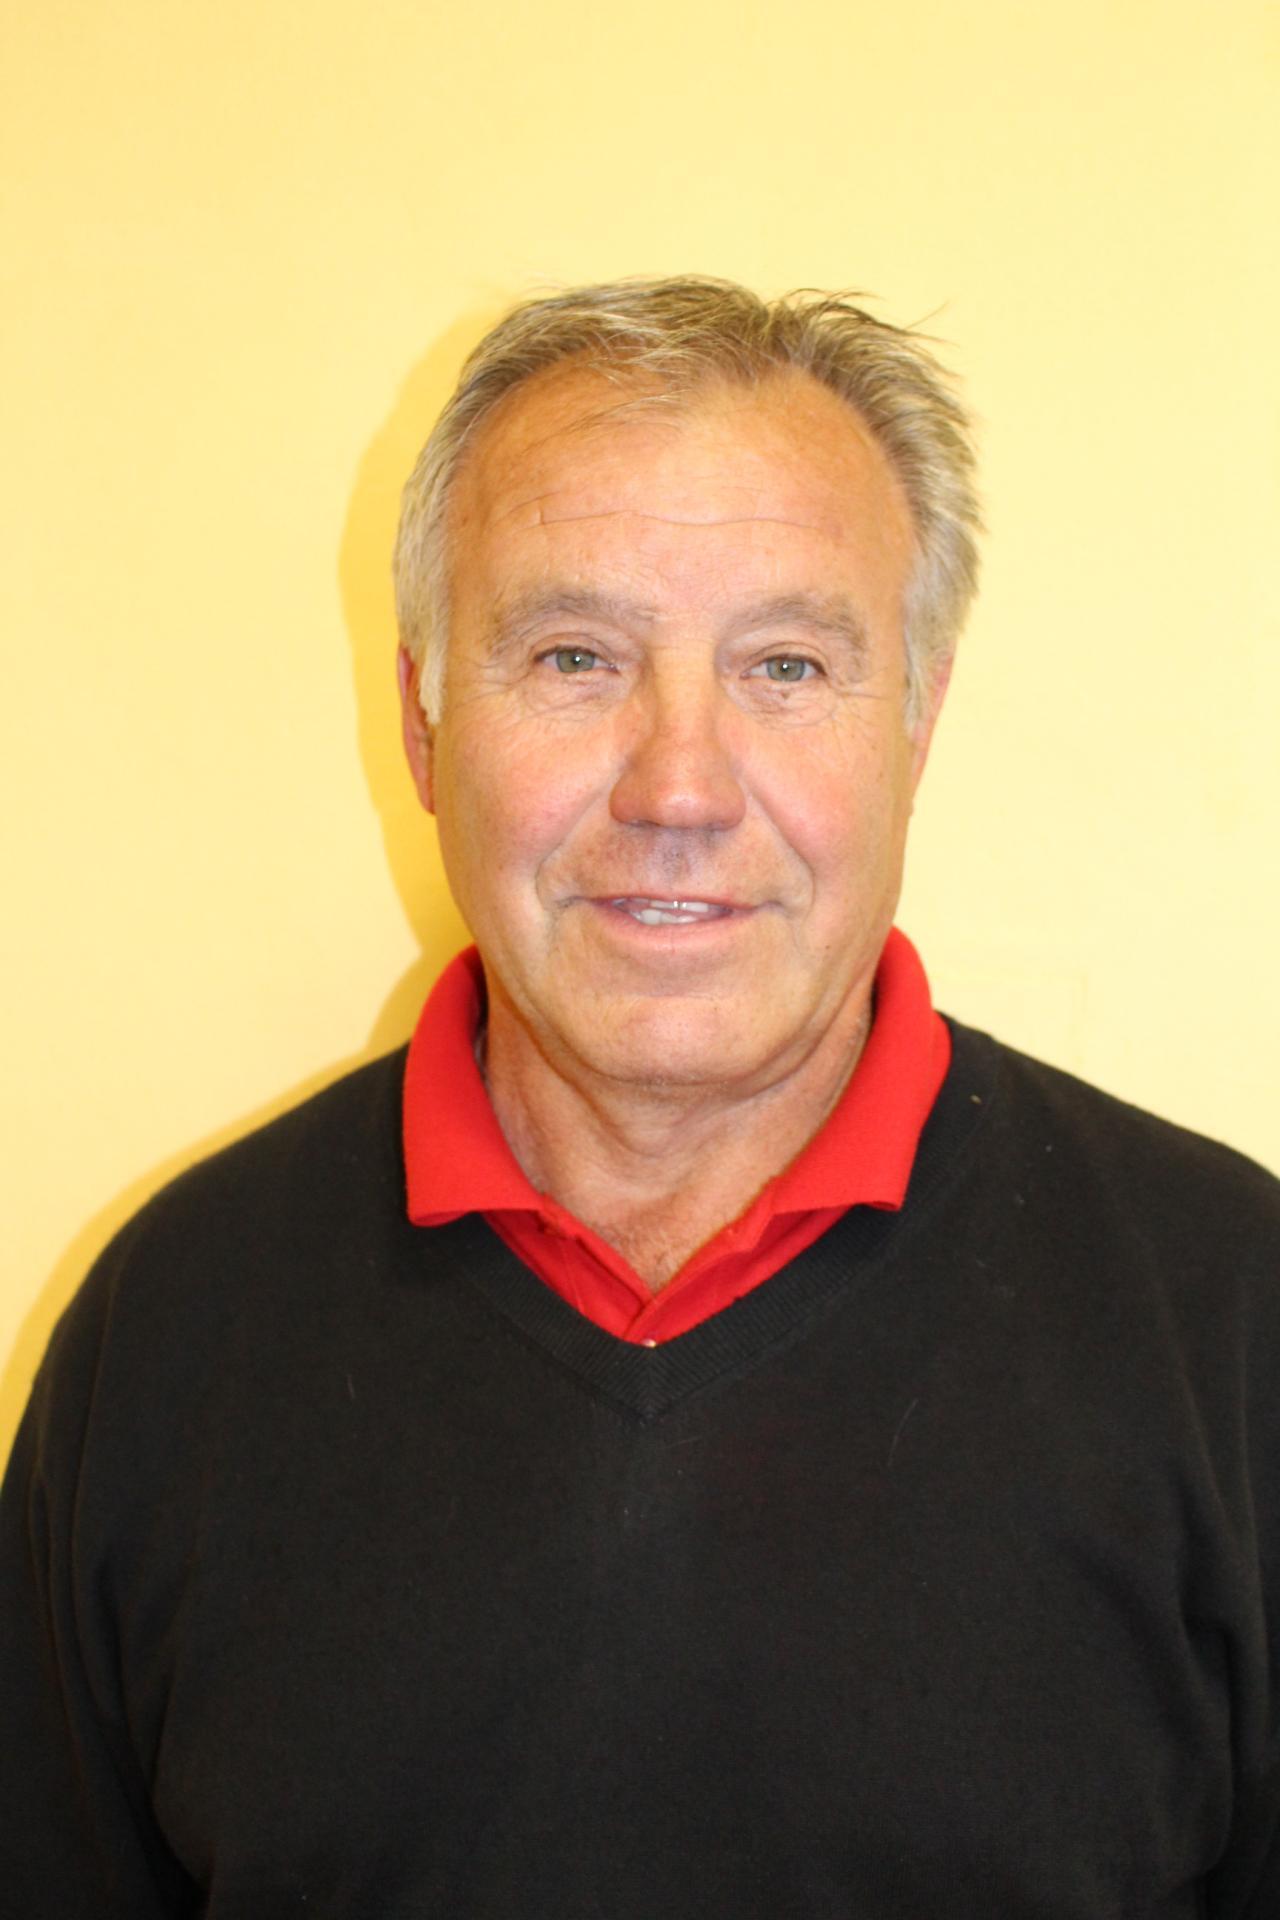 Josef Stužka člen zastupitelstva